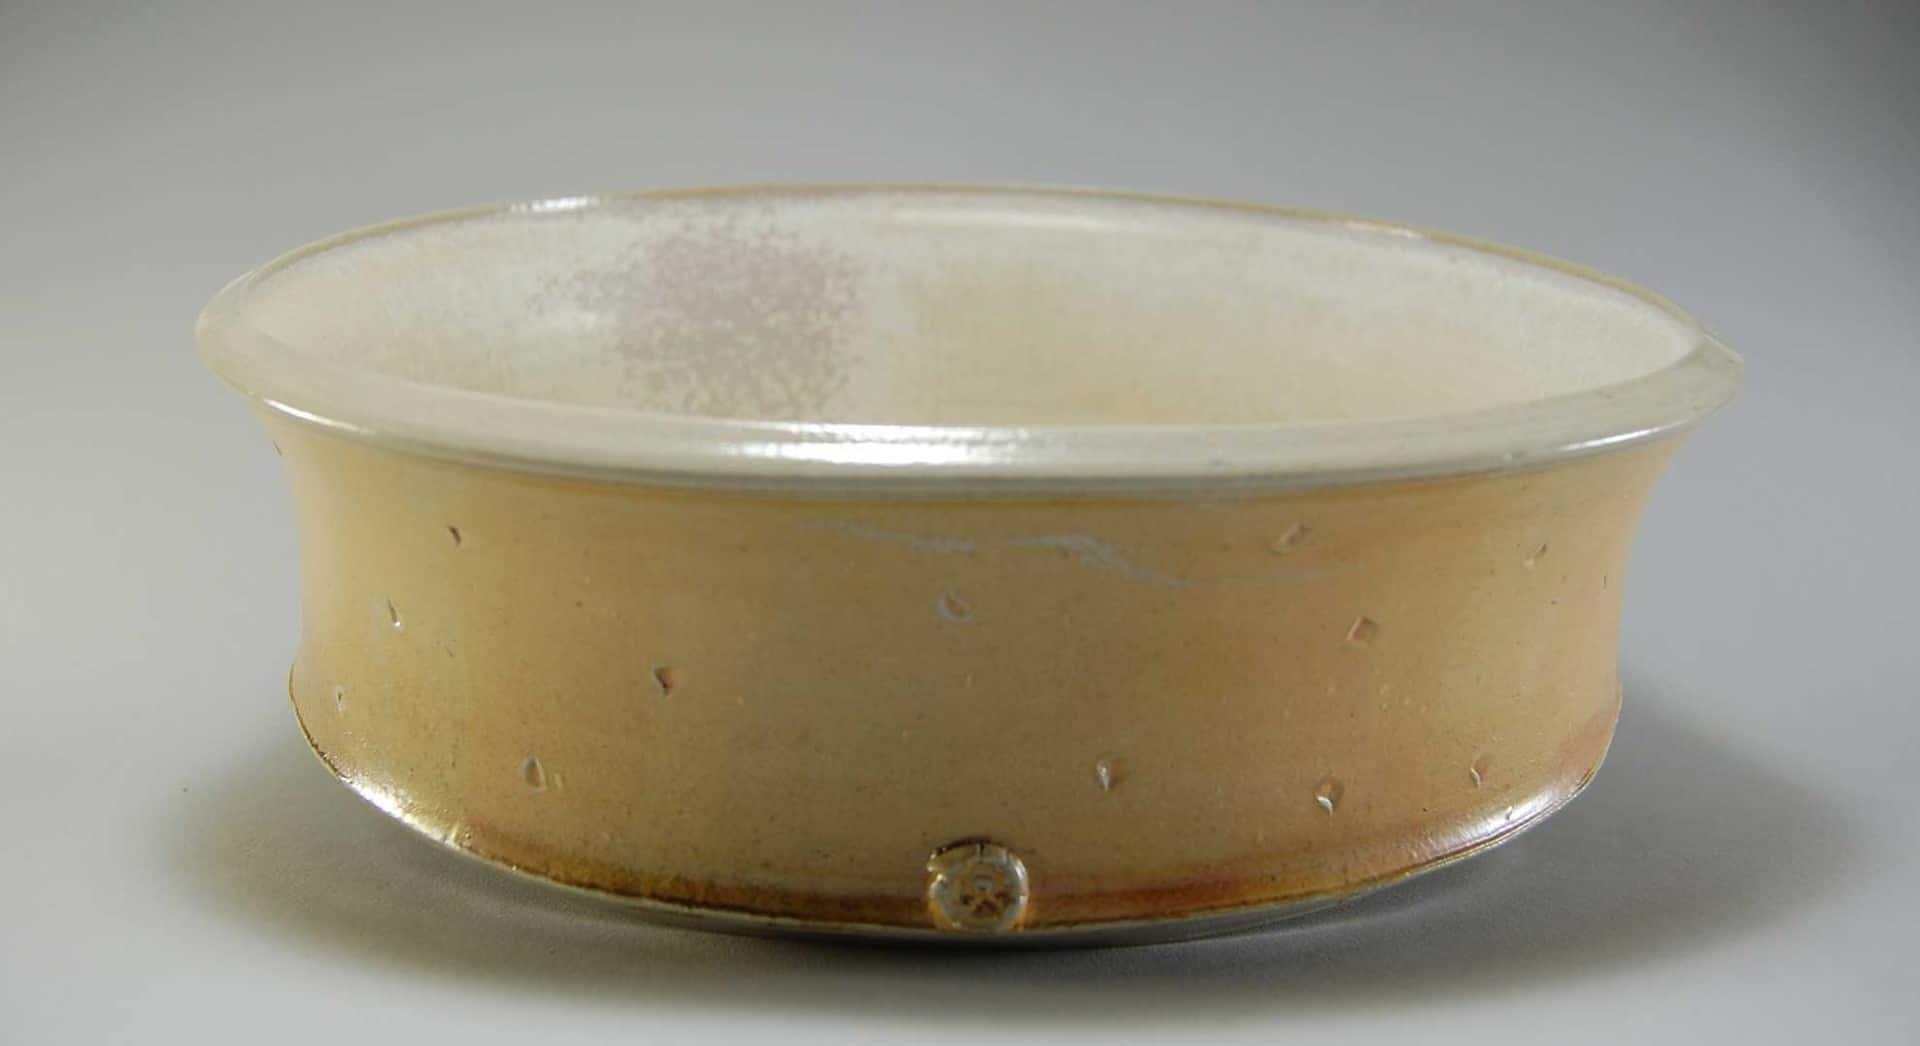 Dish02_01 (Large)